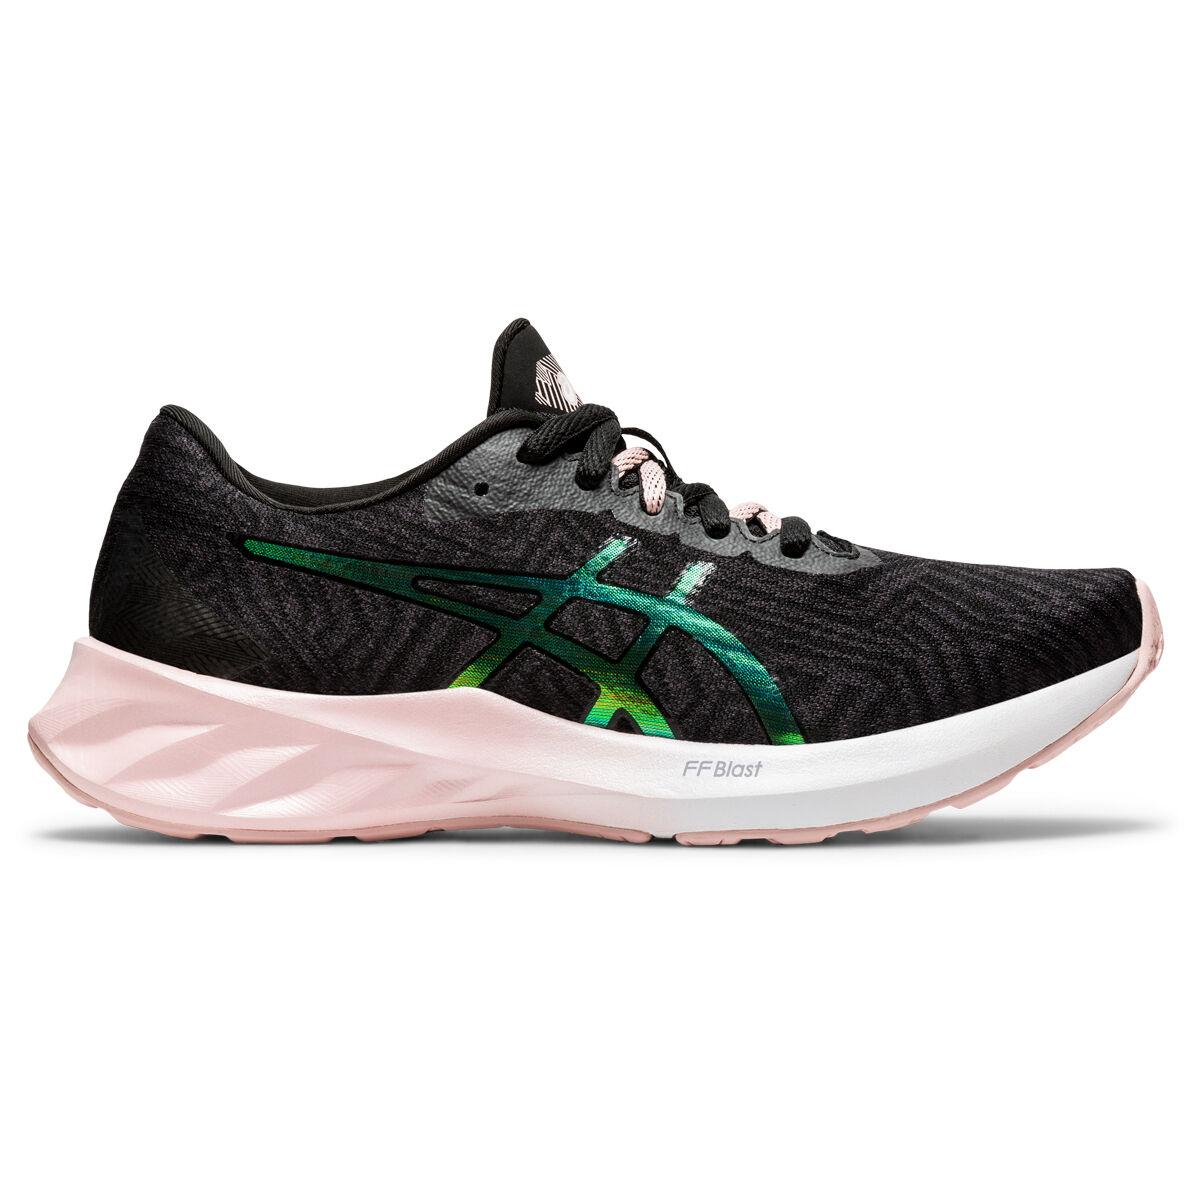 Asics Roadblast Womens Running Shoes